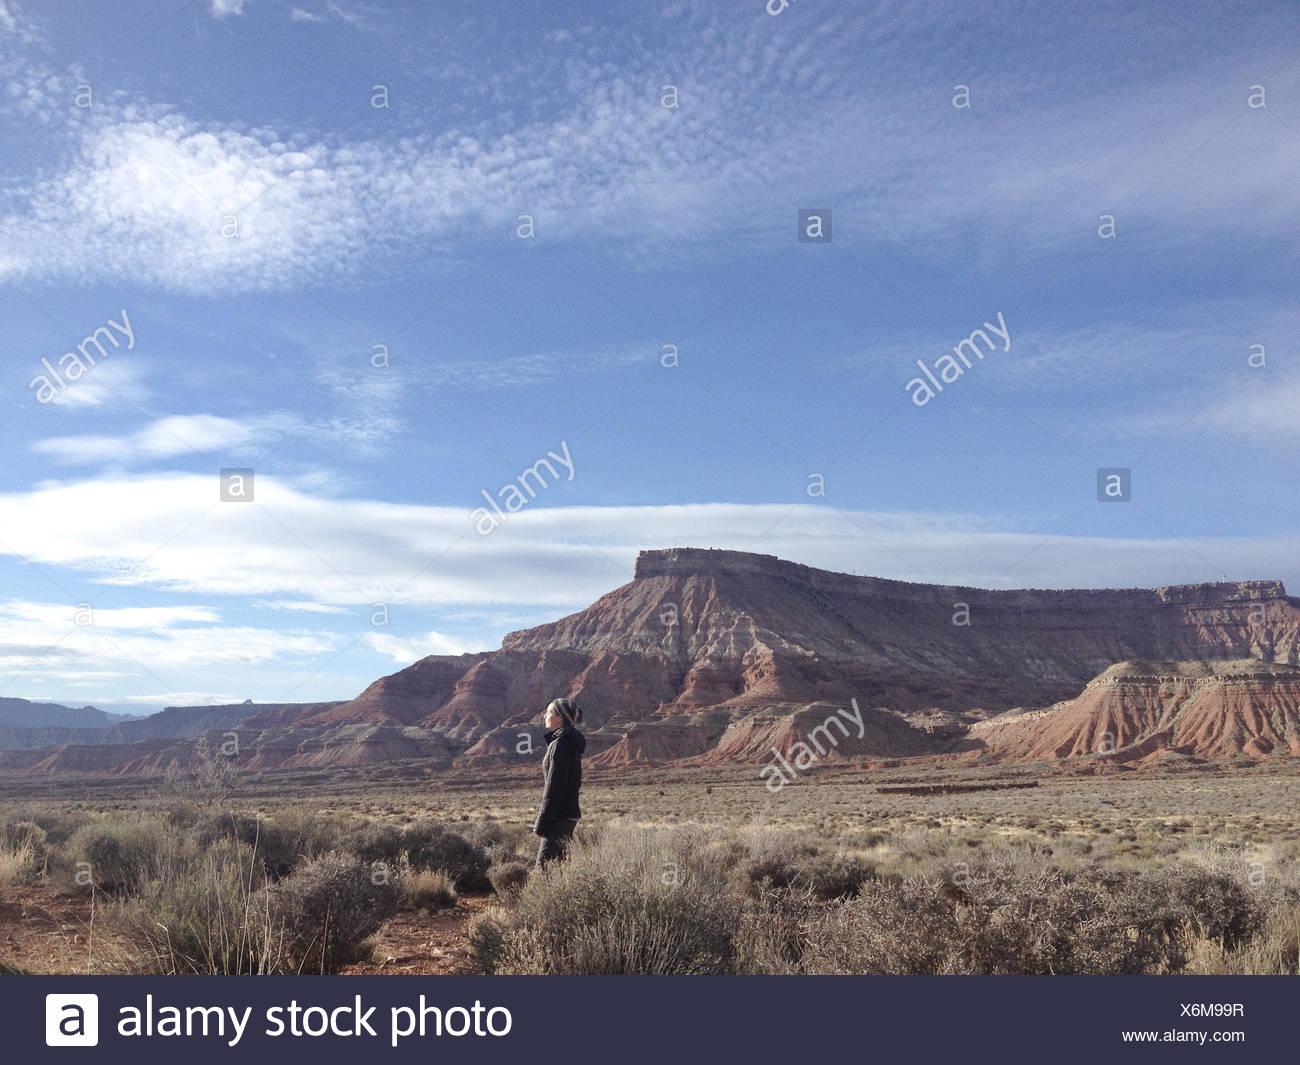 USA, Utah, Woman enjoying landscape near Zion National Park - Stock Image